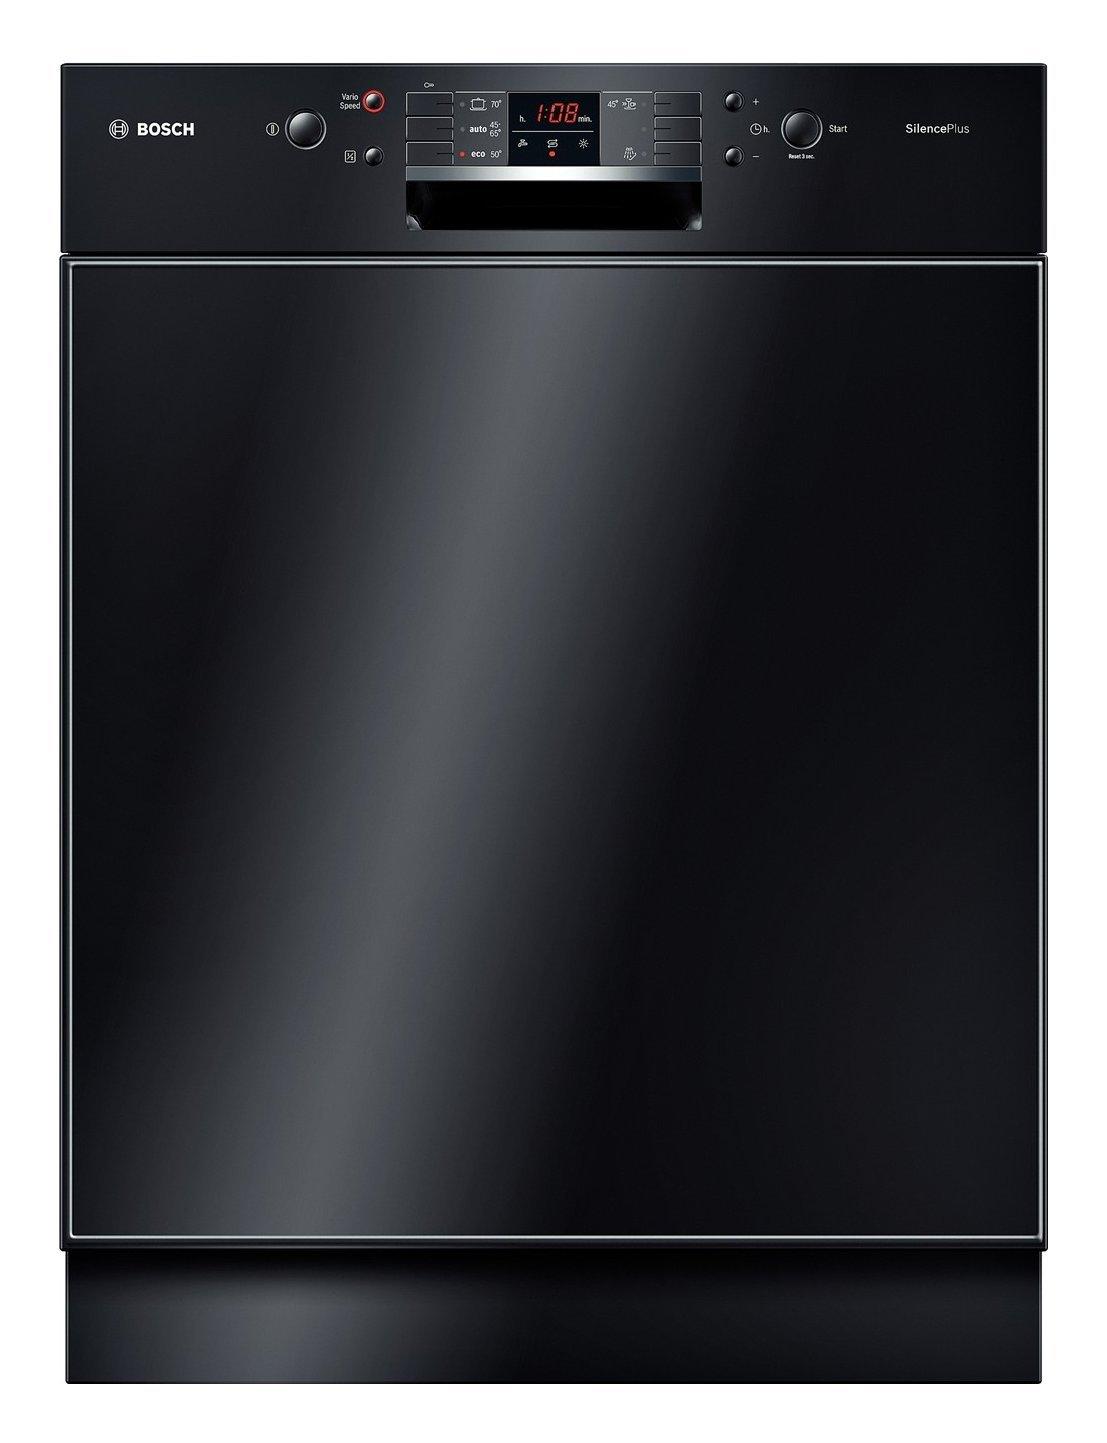 Bosch Lavavajillas smd53 m86eu SilencePlus de integrado con ...